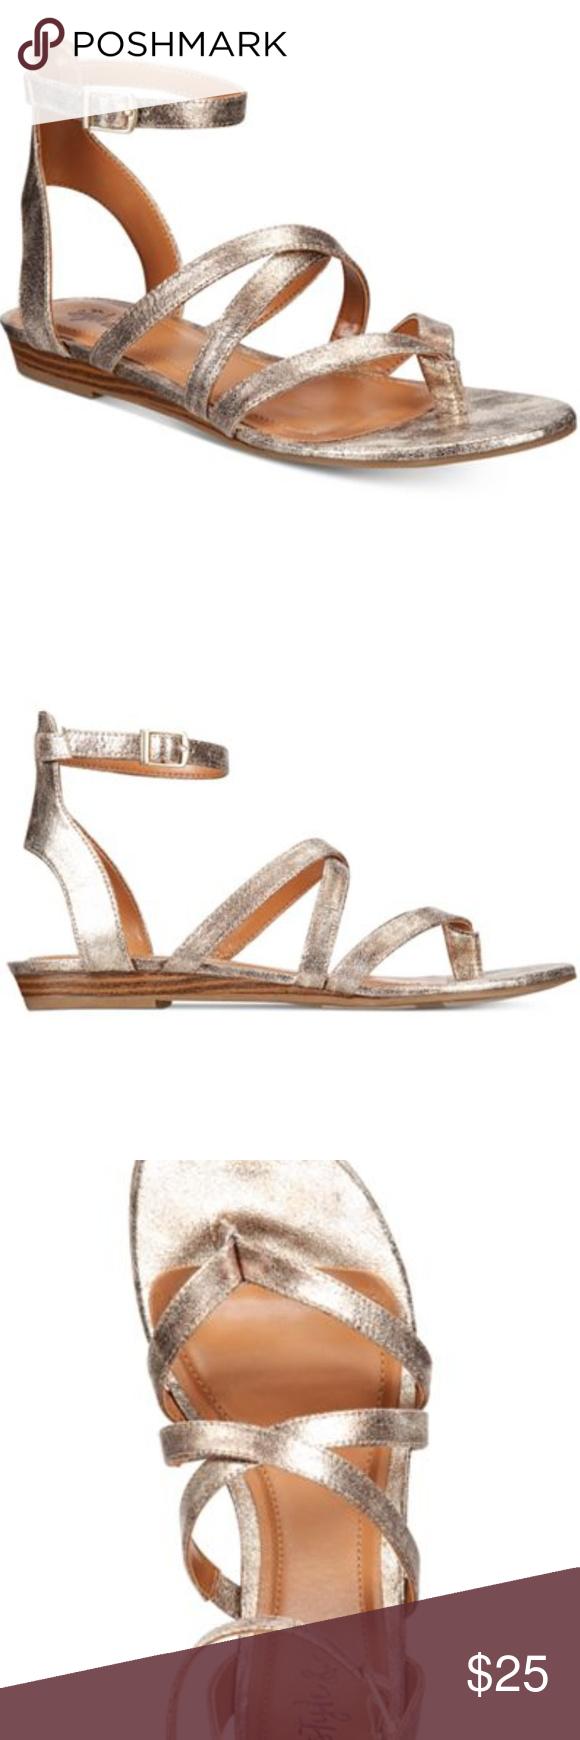 b274005e0c21a Style & Co Bahara Strappy Sandals - NWT Sz. 8 Merging crisscross ...